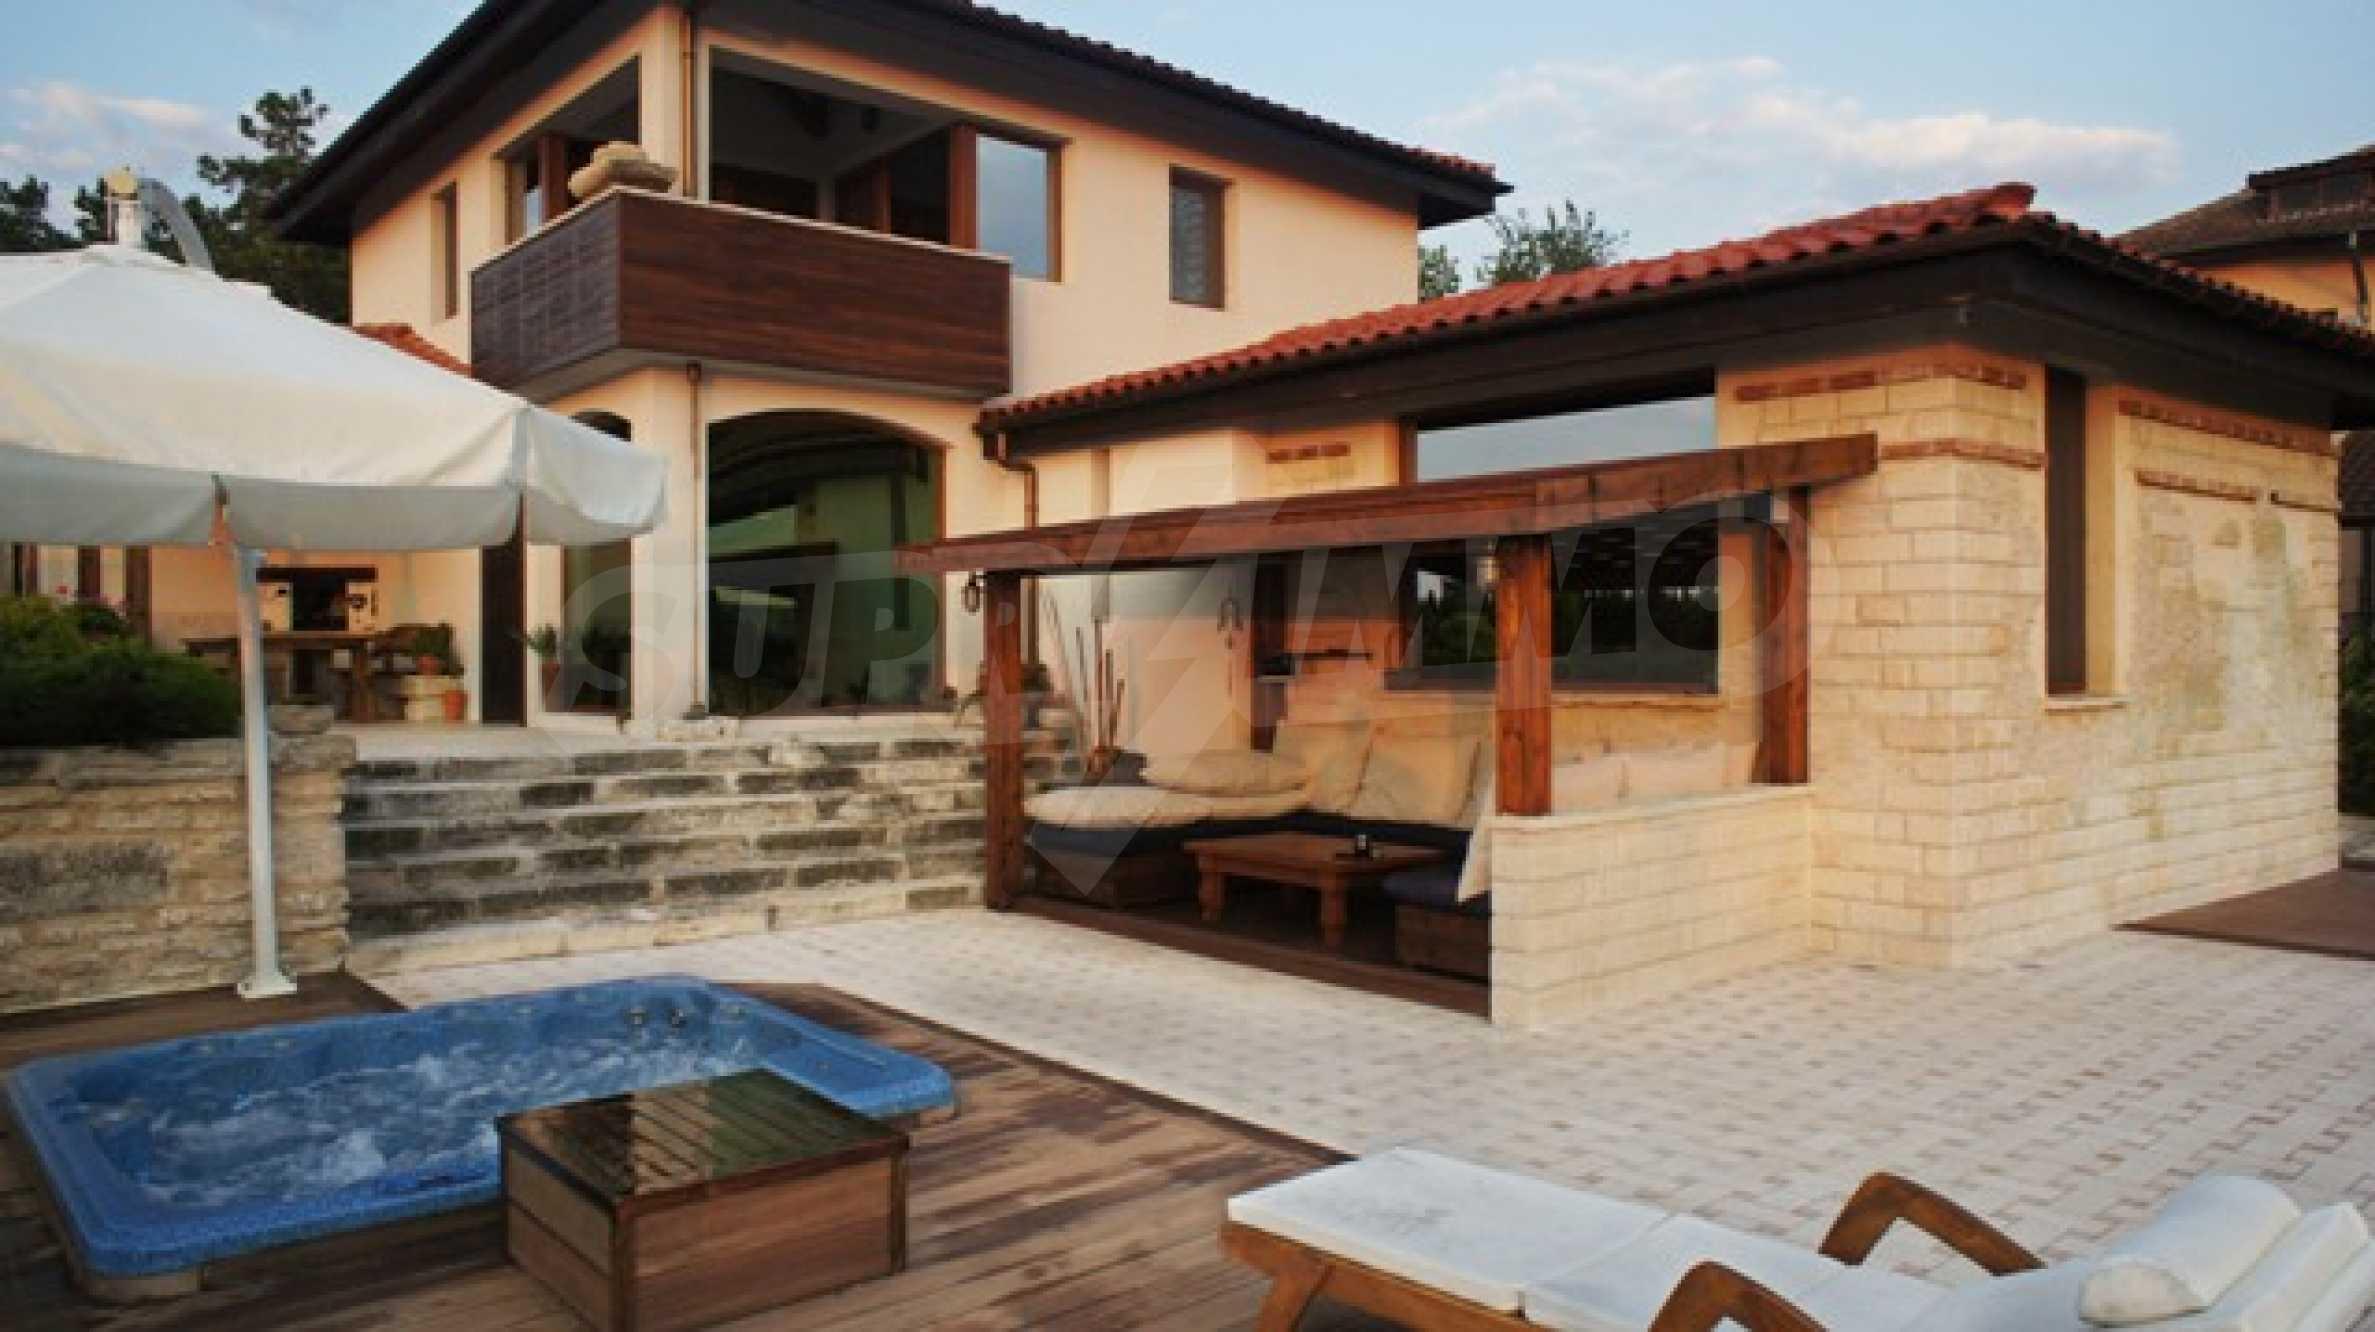 The Mediterranean style - a sense of luxury 7